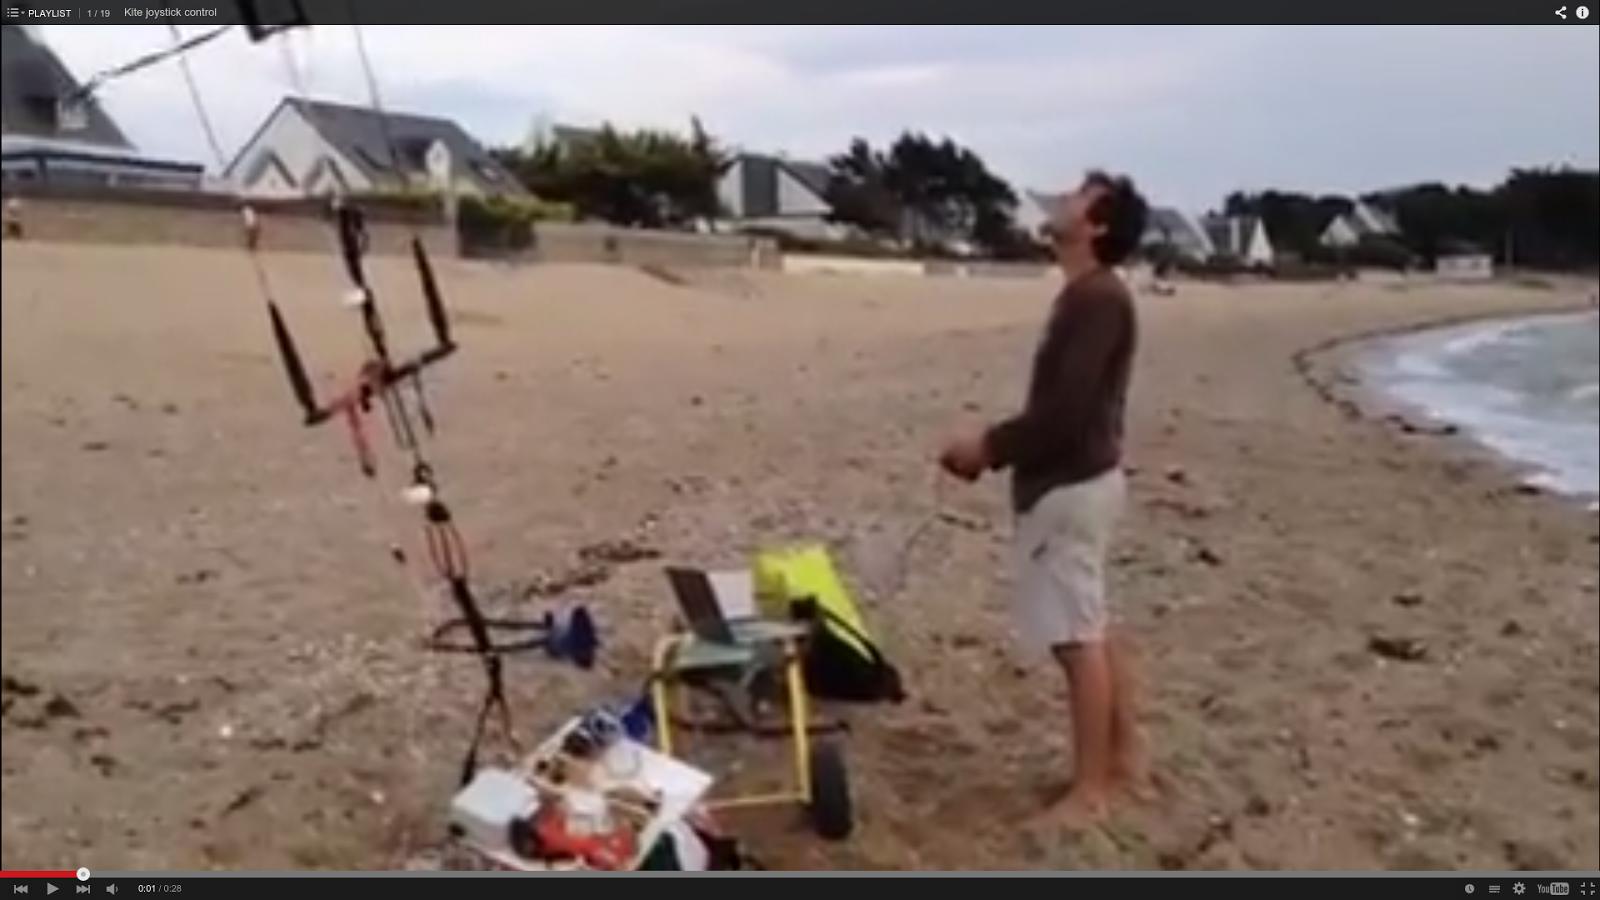 Joystick kite control